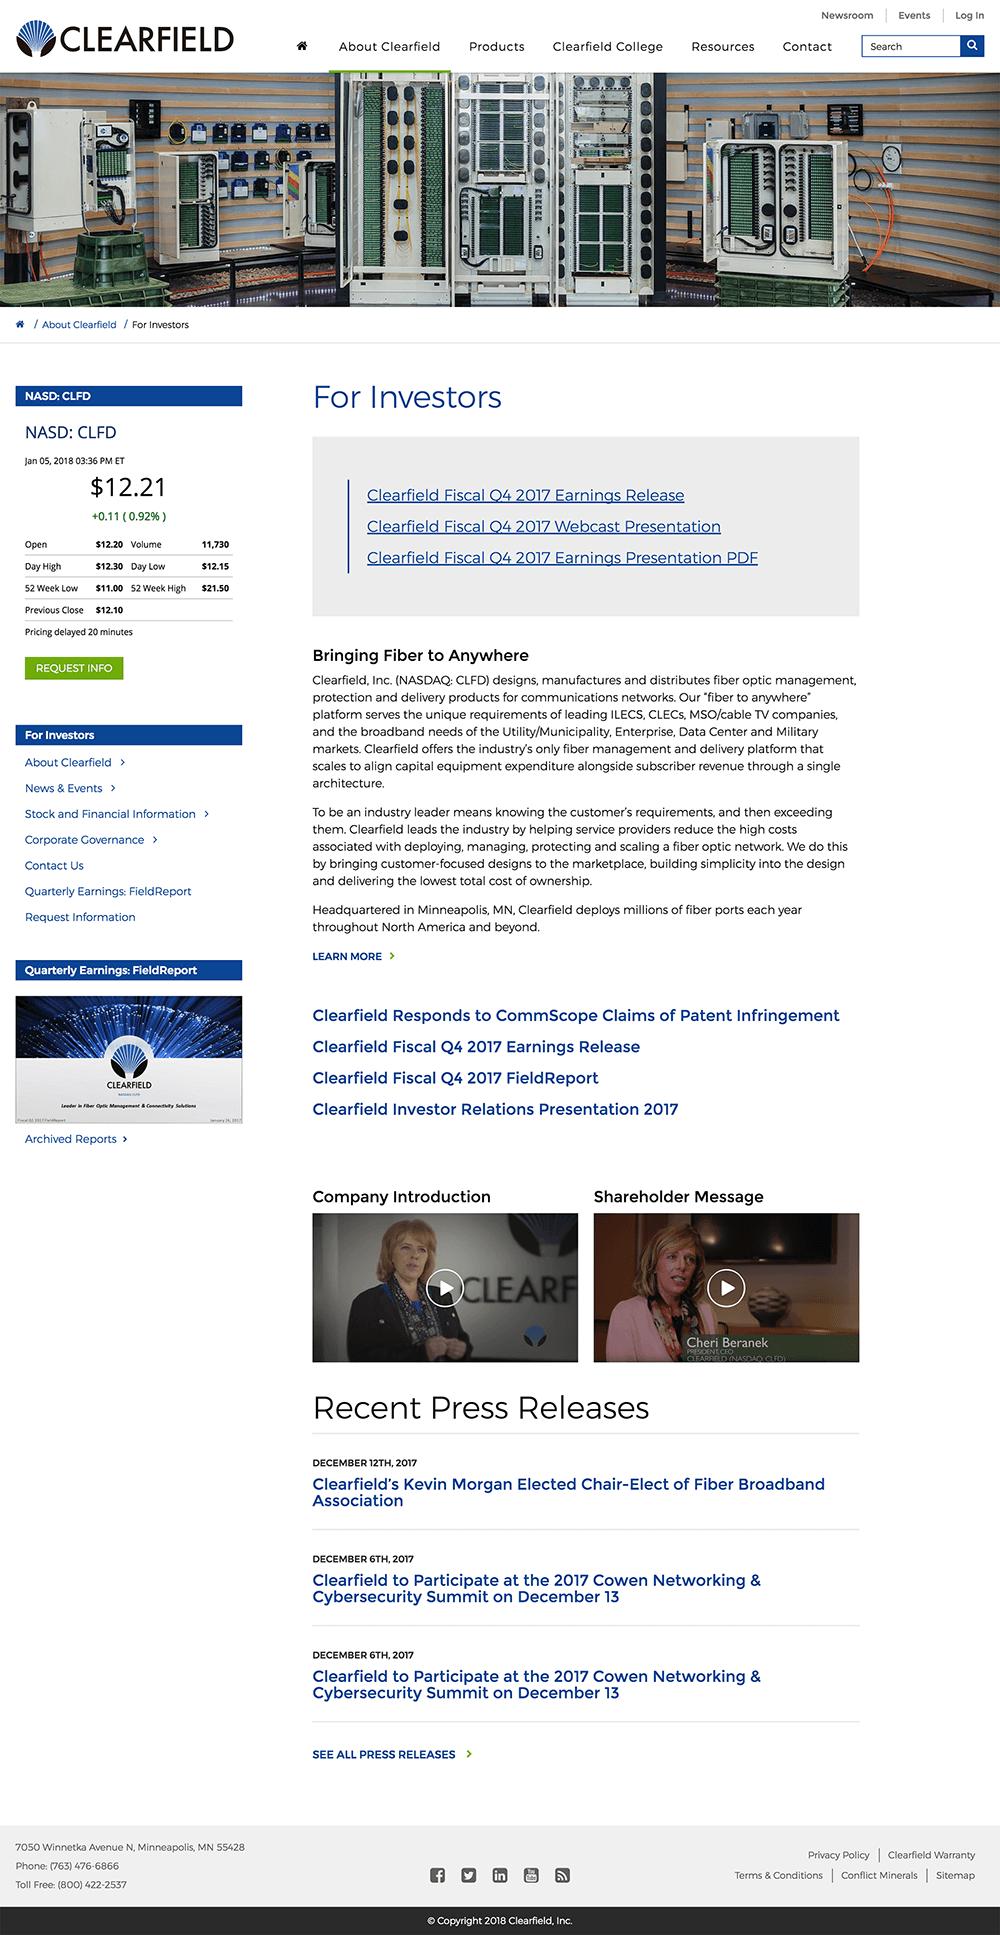 Design of investors web page